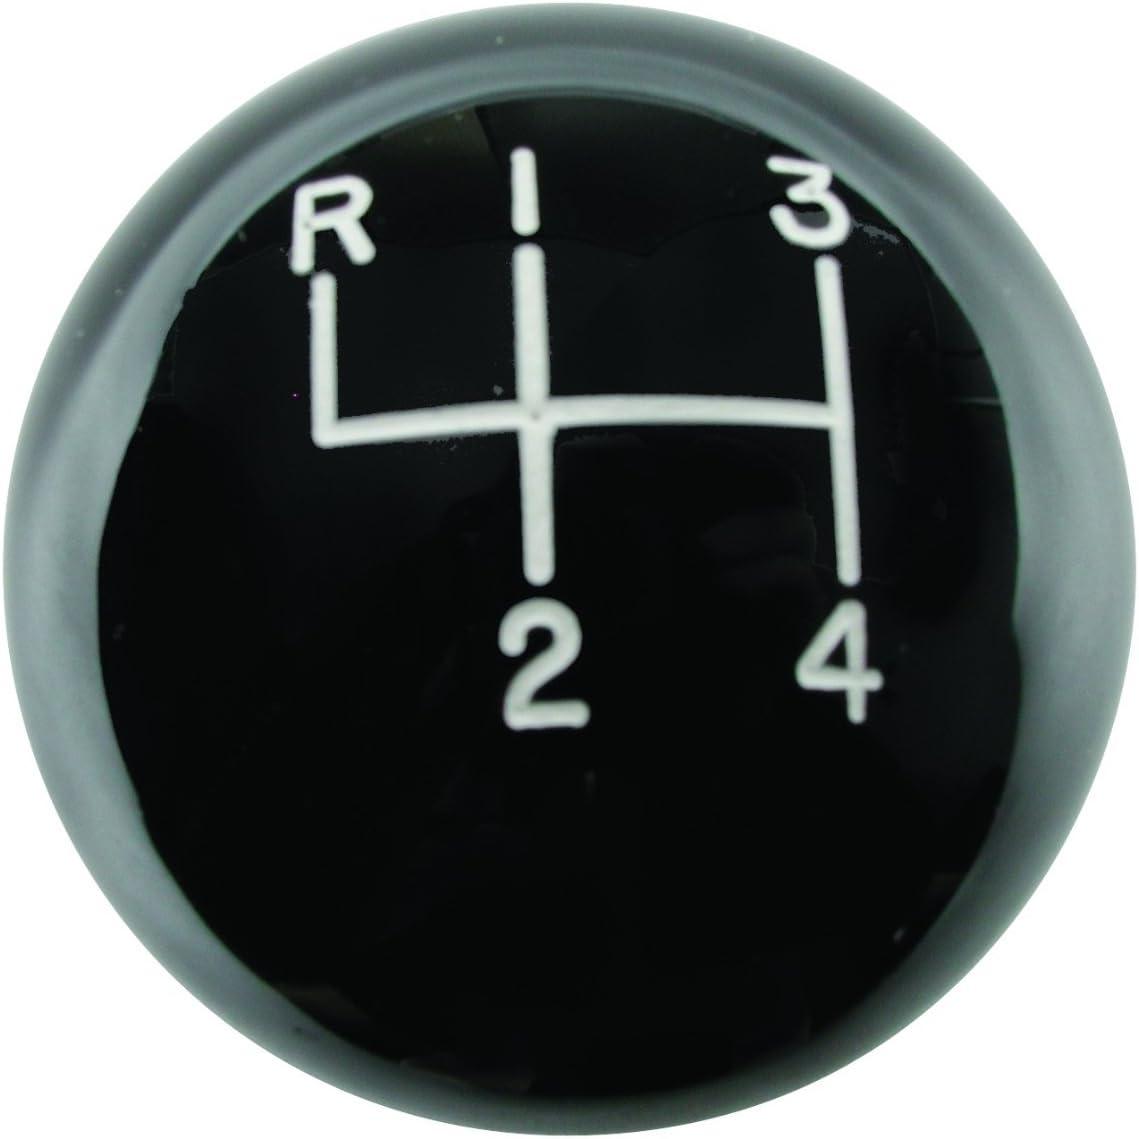 "Hurst 1630003 4 Speed Engraved Pattern White Shifter Knob Ball  3//8/"" x 16 Thread"